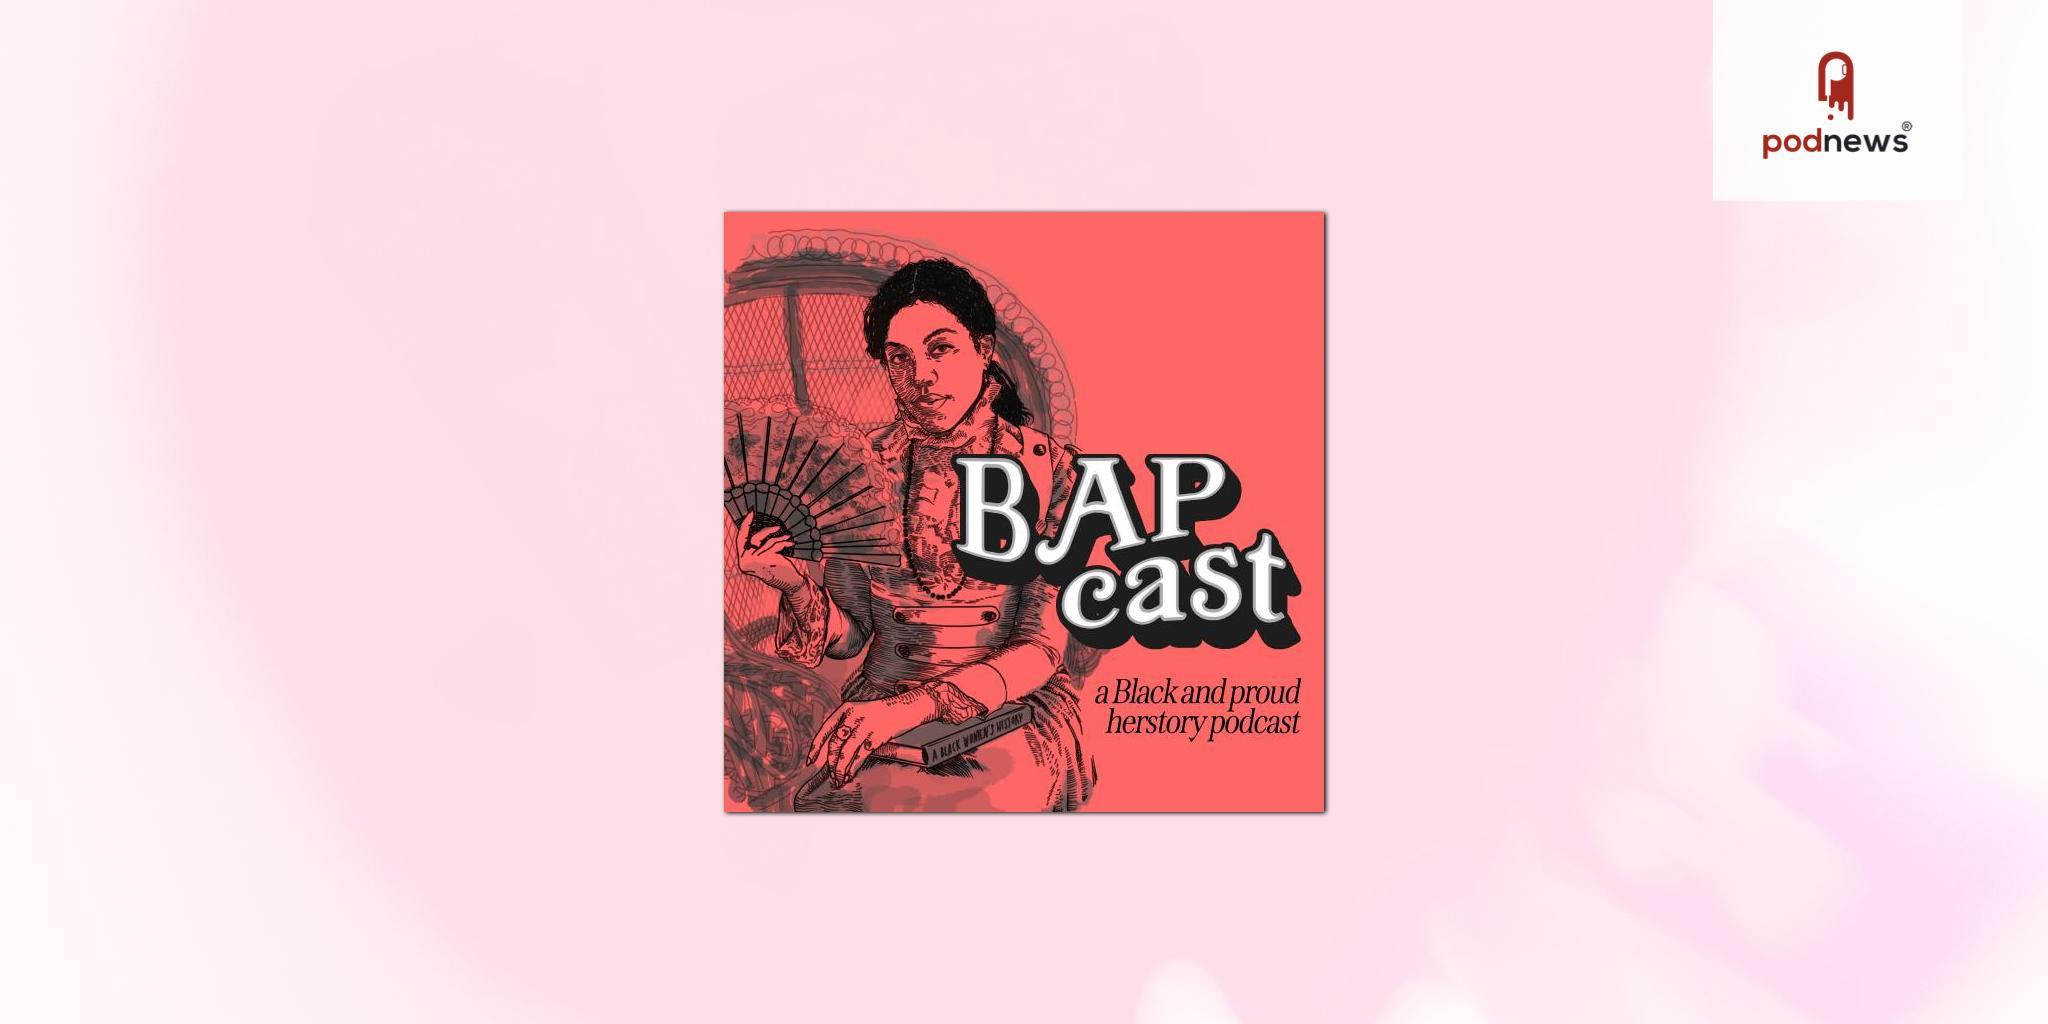 Black Herstory Podcast BAPcast Launching Juneteenth